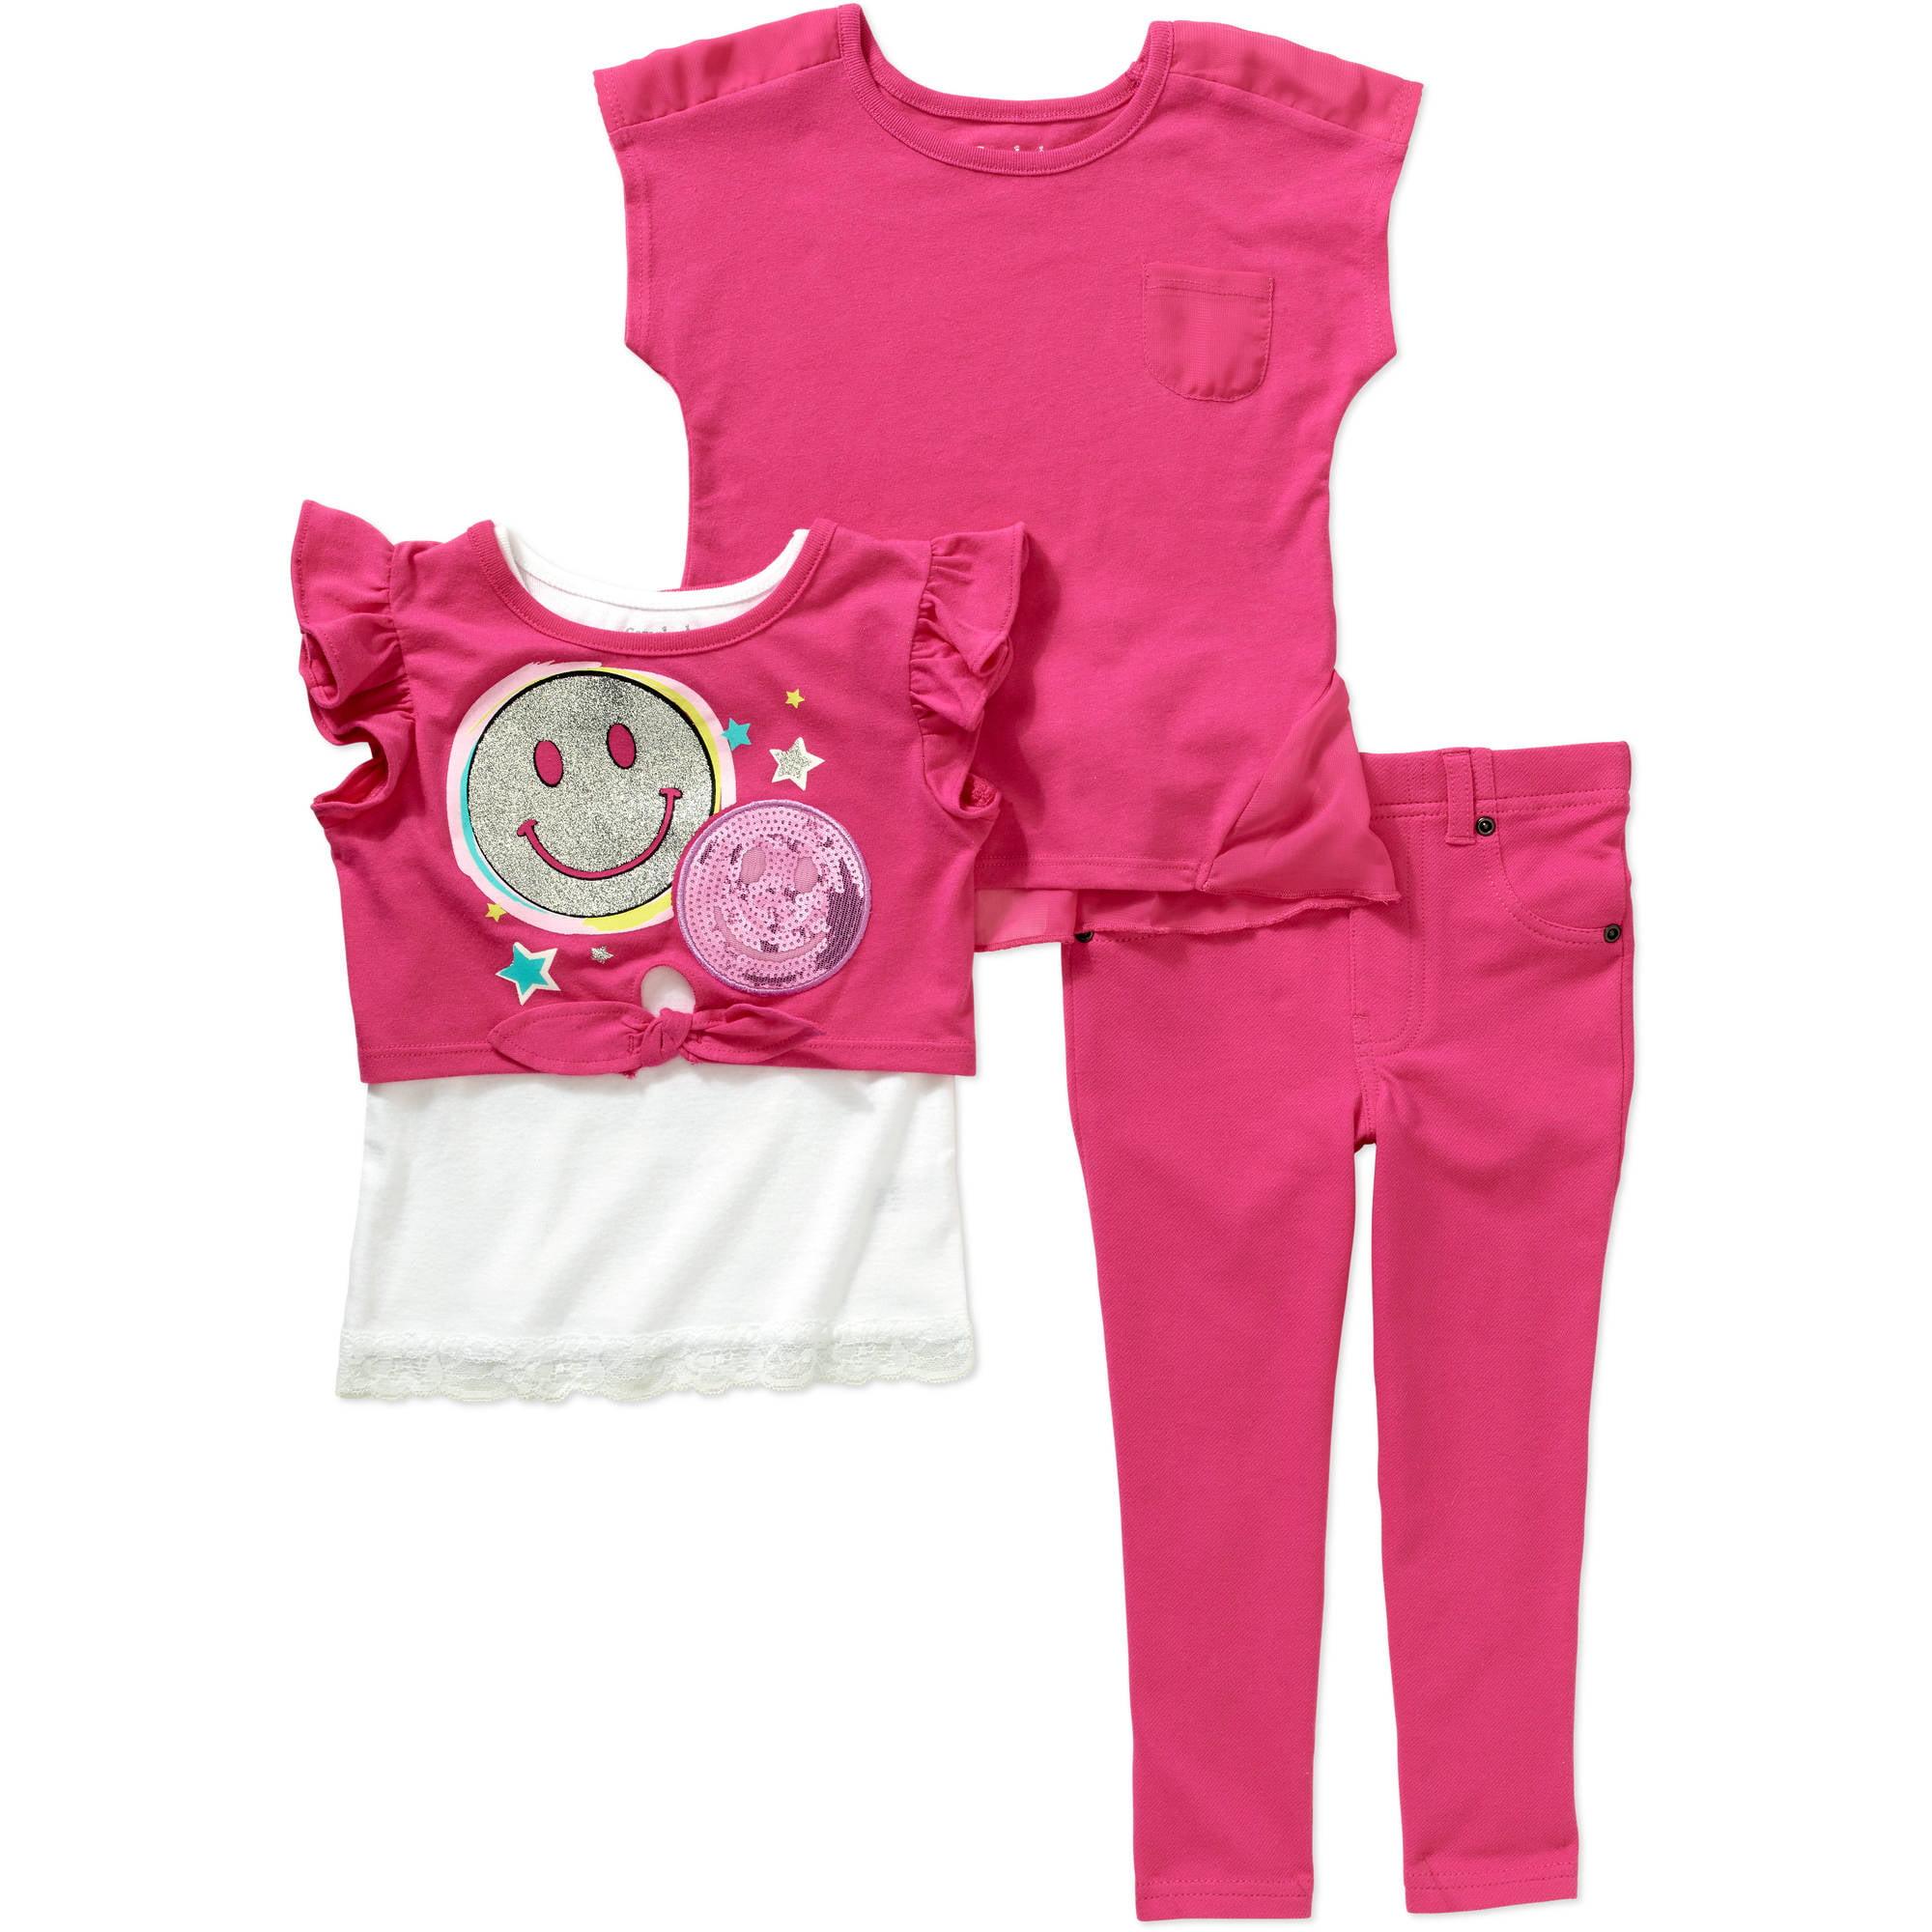 Garanimals Baby Toddler Girl Short Sleeve 2Fer Tee, Pocket Tee, & Jeggings 3-Piece Outfit Set